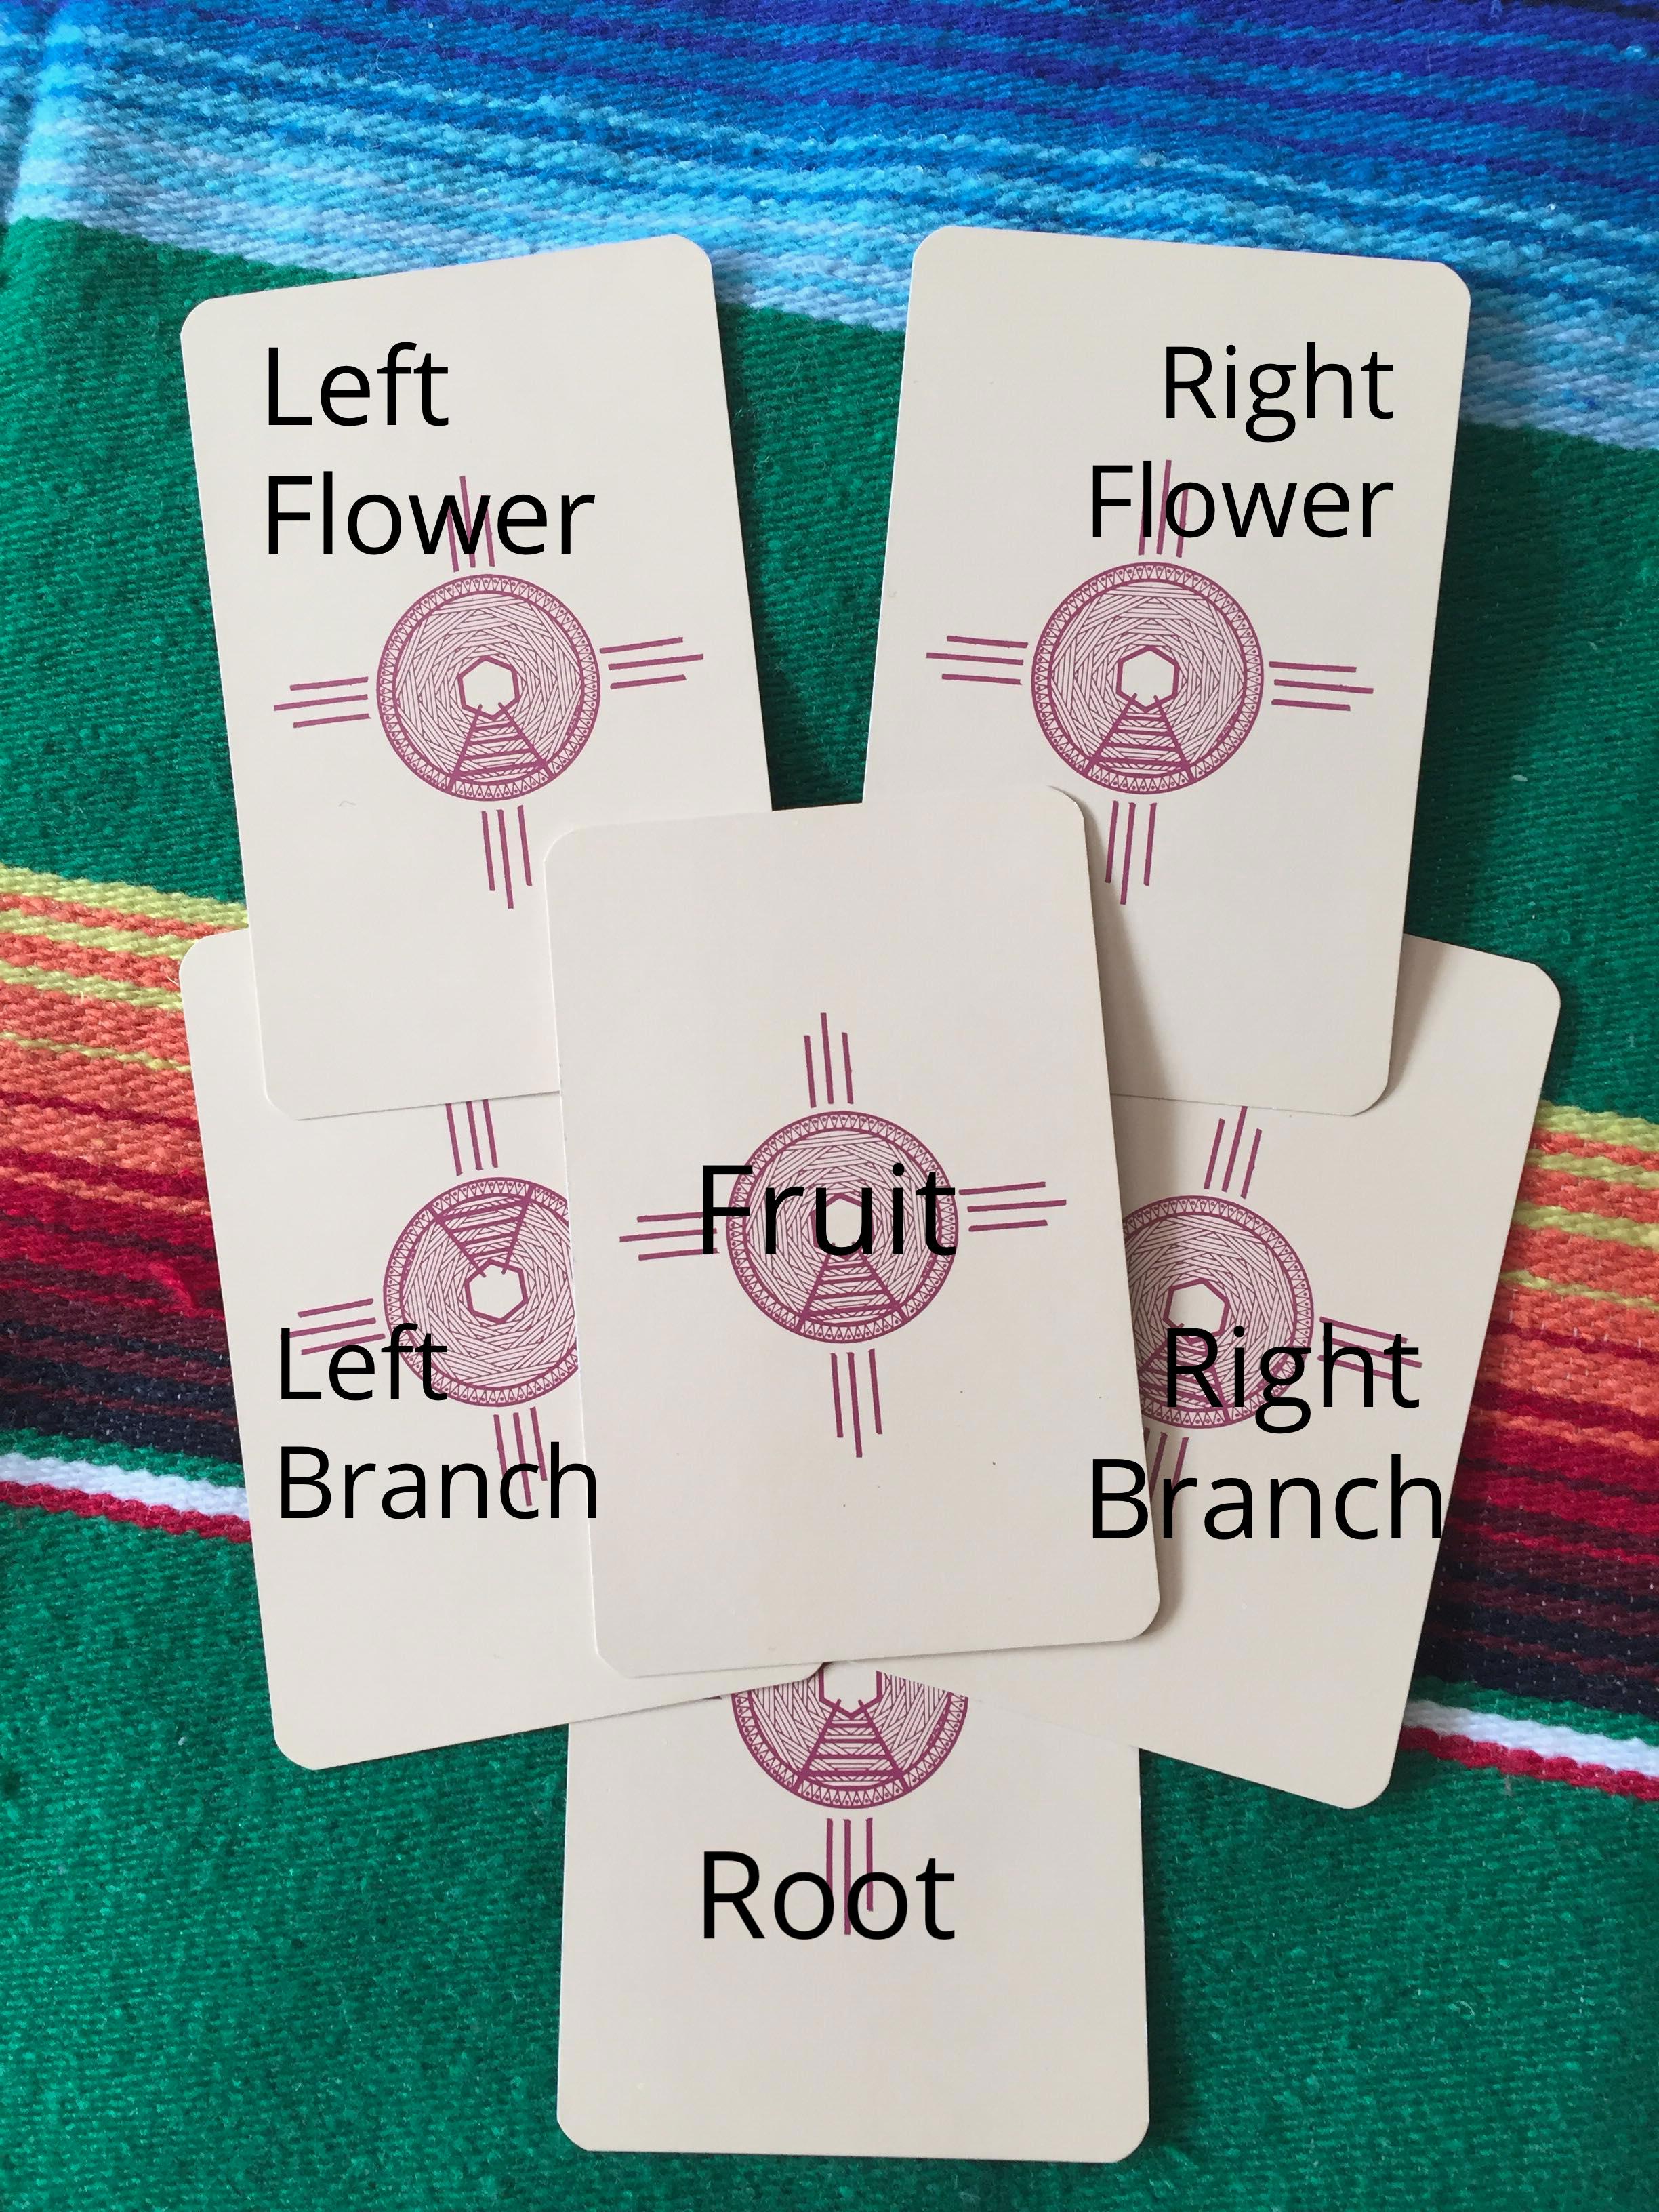 lovetree spread